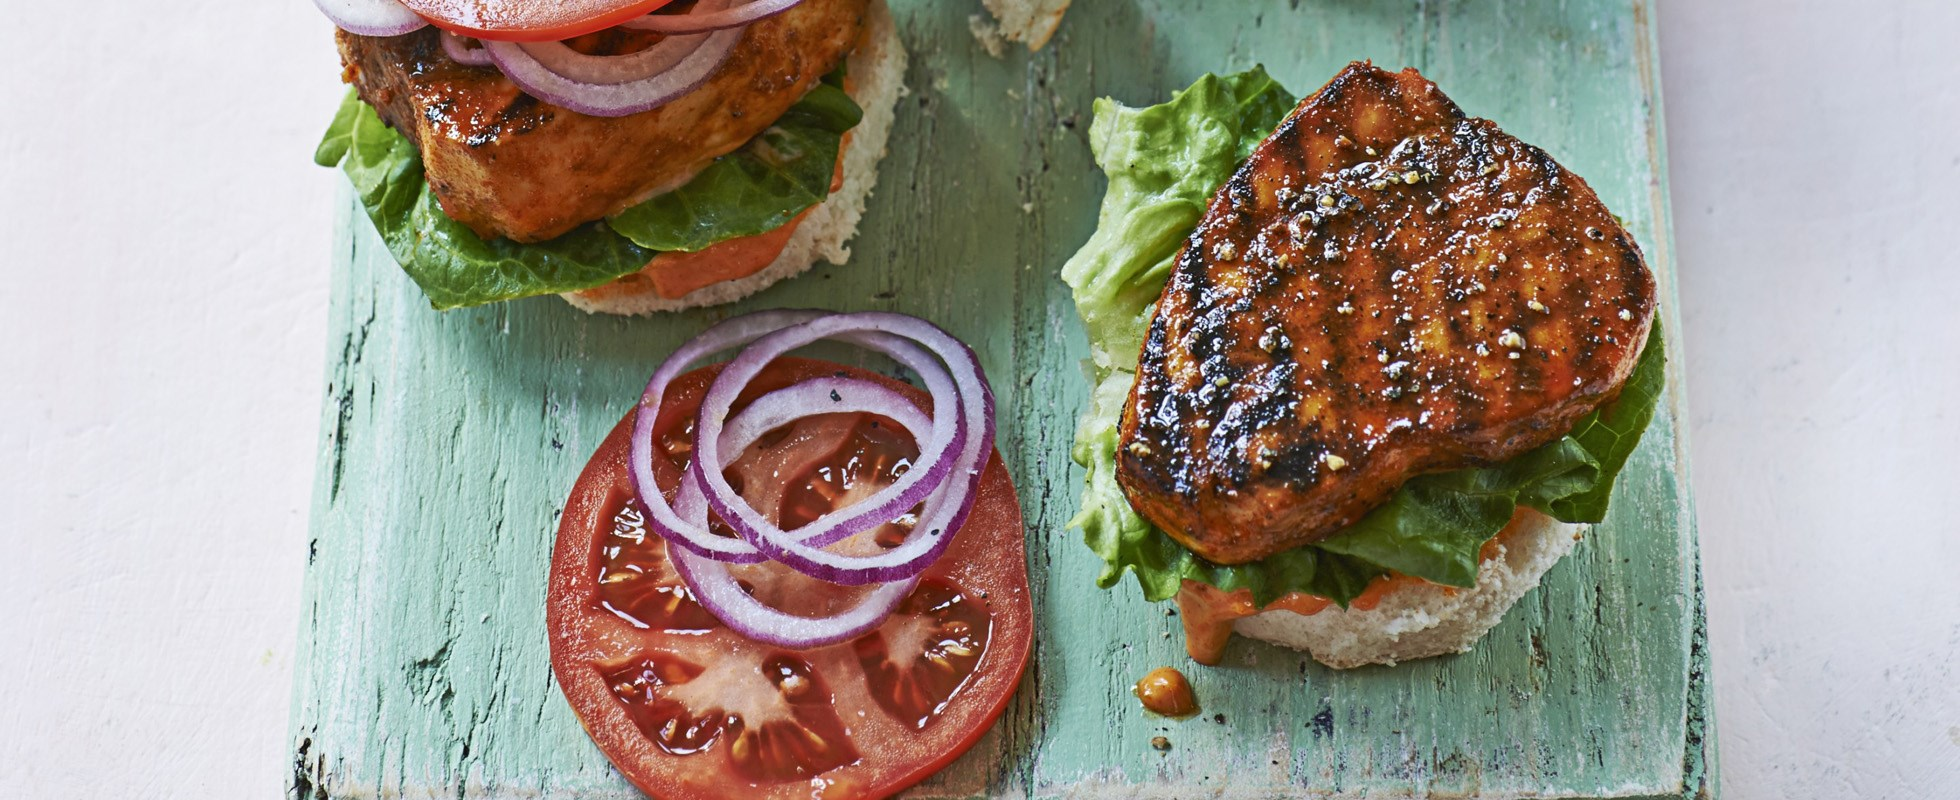 Miami-style blackened fish sandwich